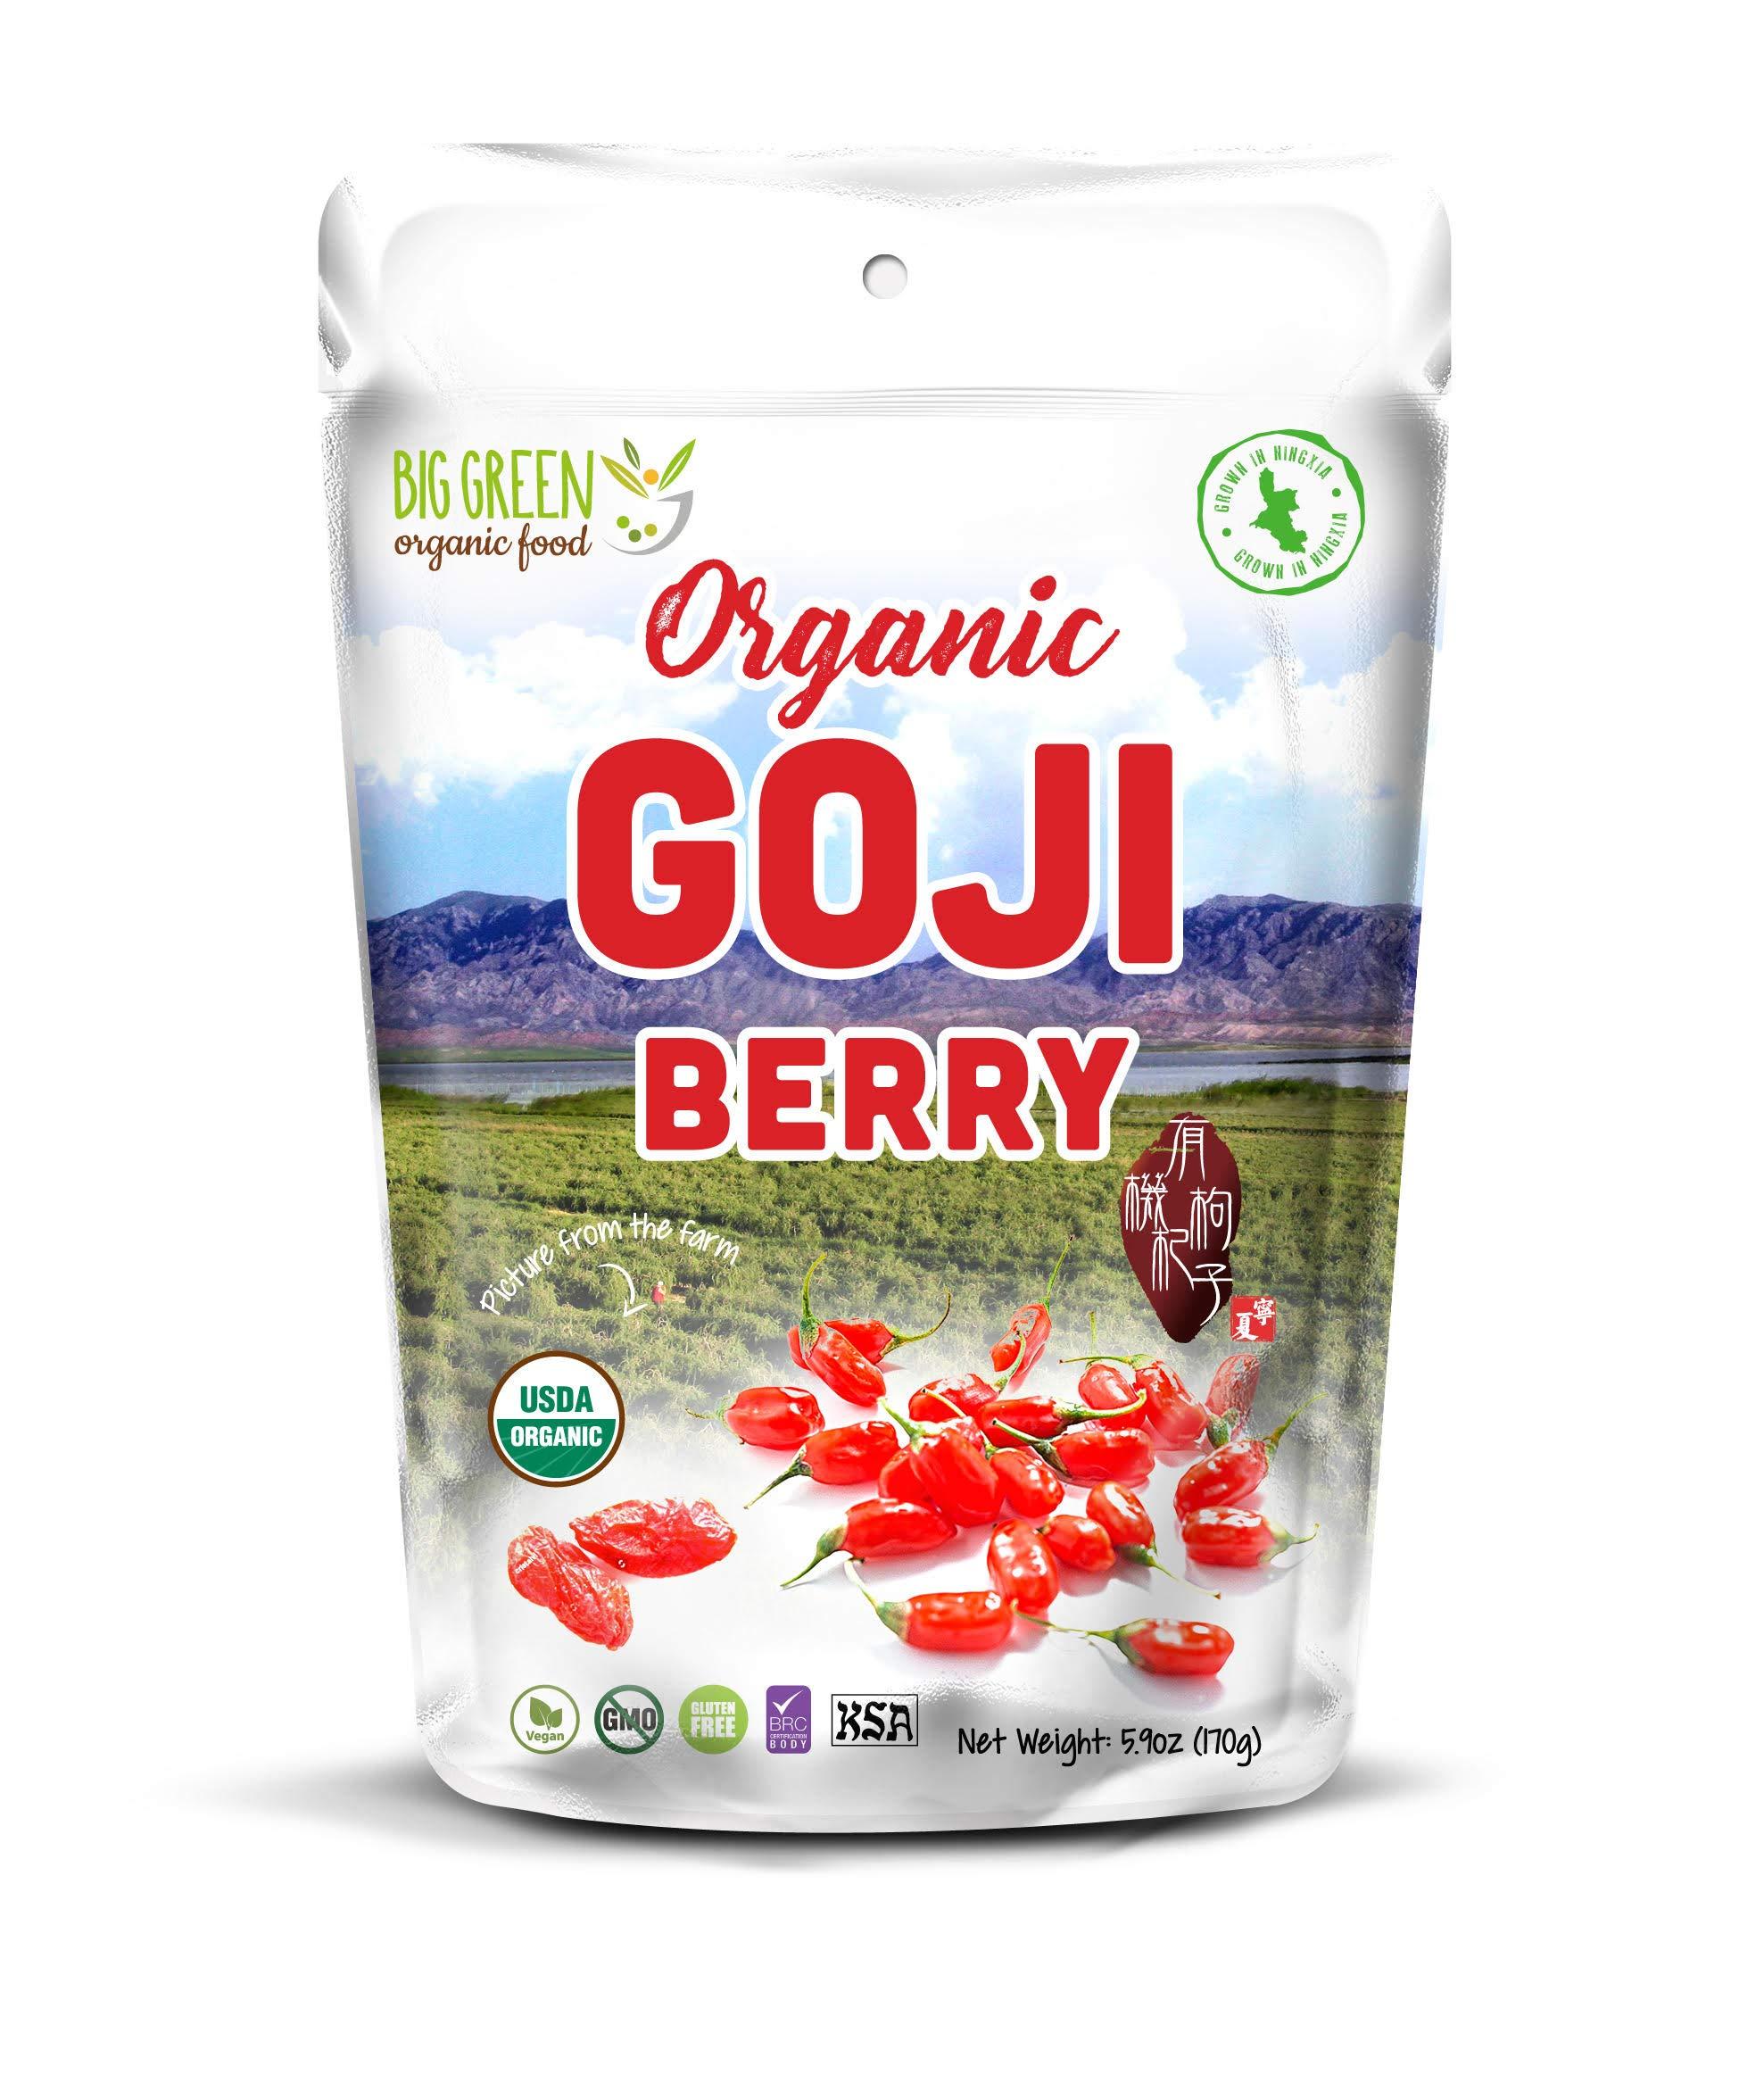 Big Green Organic Food- Organic Goji Berry, Pre-Washed, Ready-to-eat, Vegan, Delightful Snacks